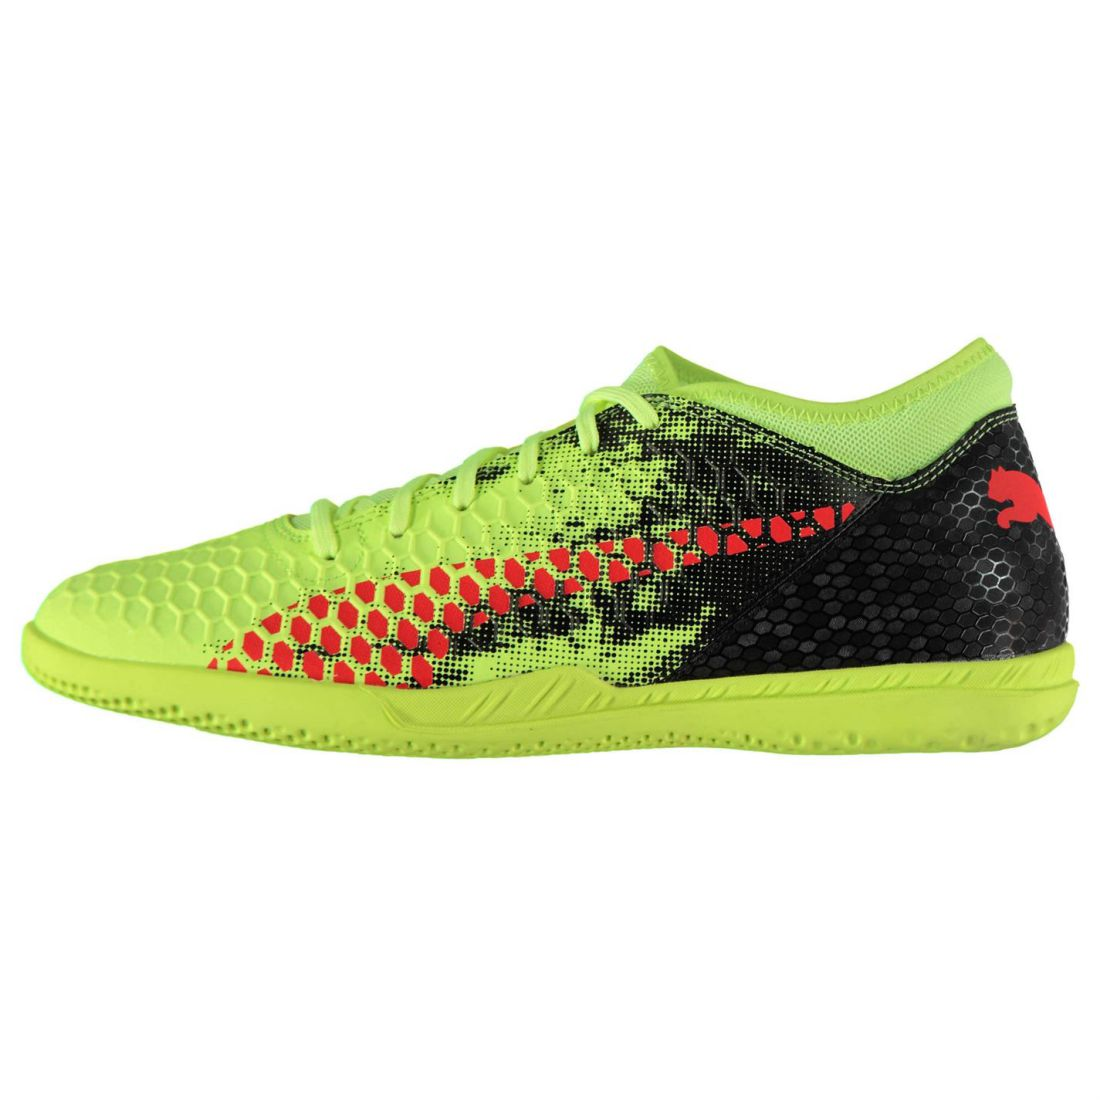 Puma Mens Future 18.4 Indoor Football Trainers Boots Shoes Lace ... 0a362b8e19a9